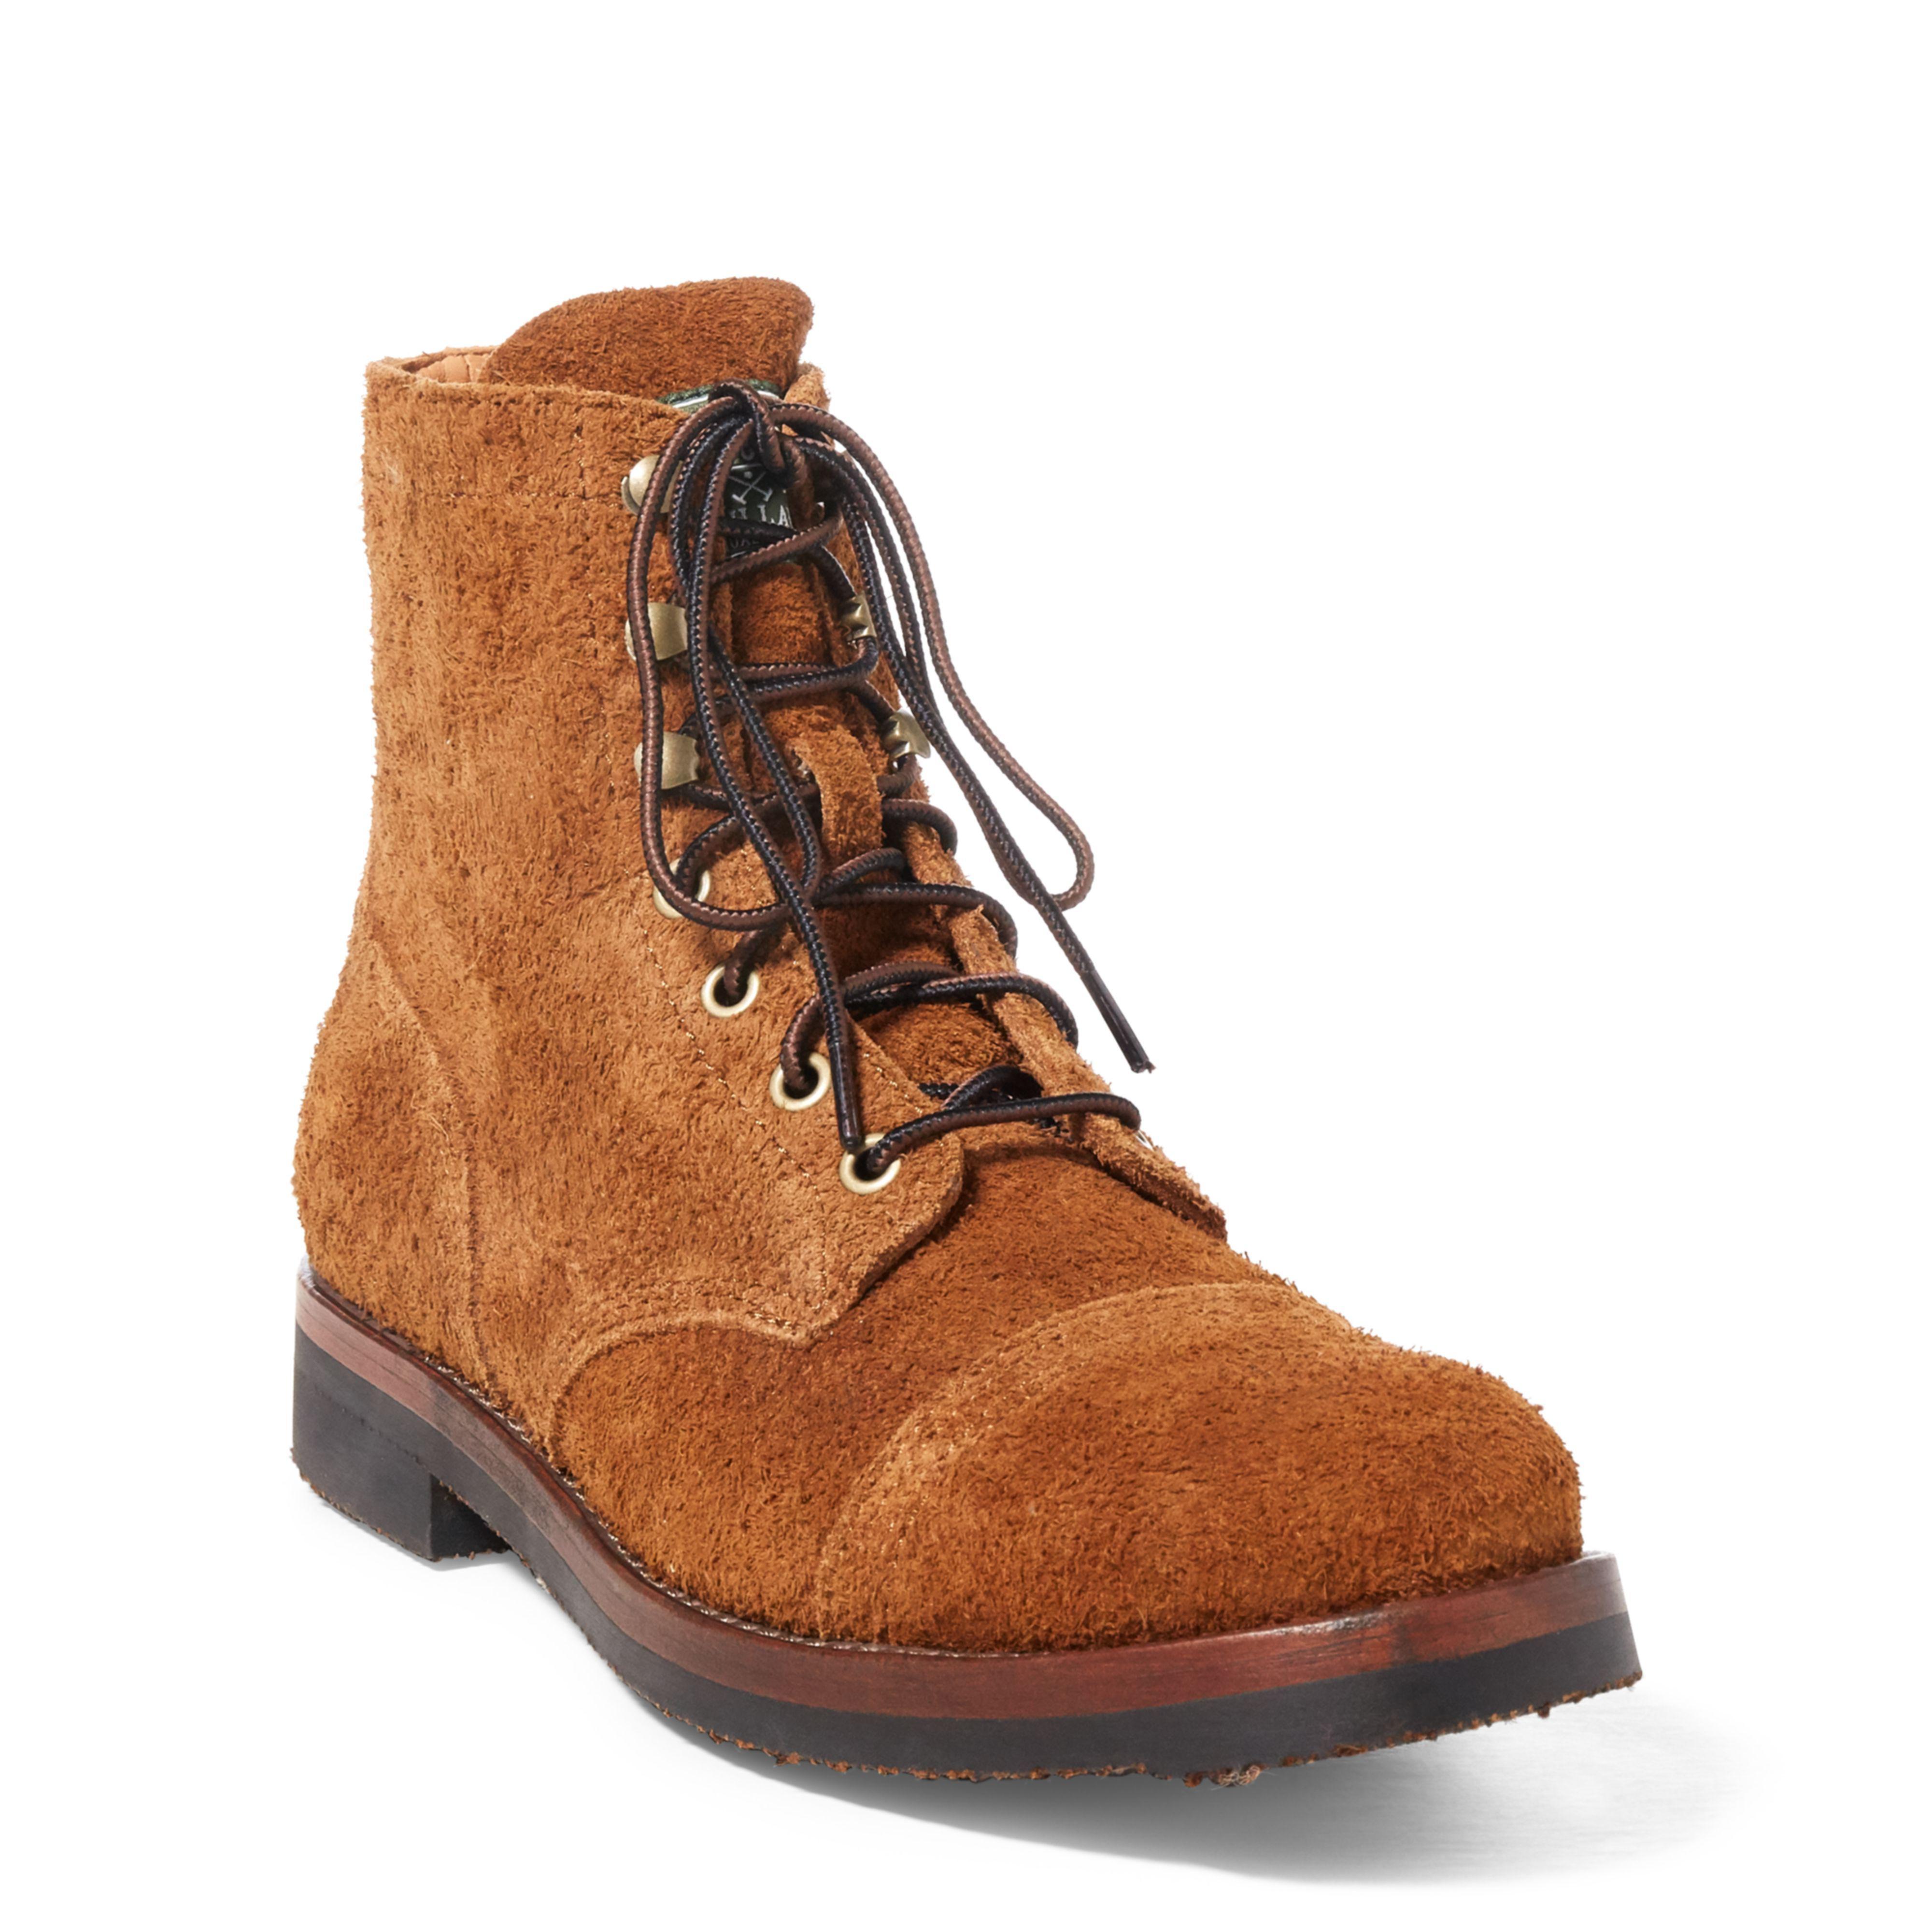 901fc6744354f Polo Ralph Lauren Enville Suede Cap-toe Boot in Brown for Men - Lyst